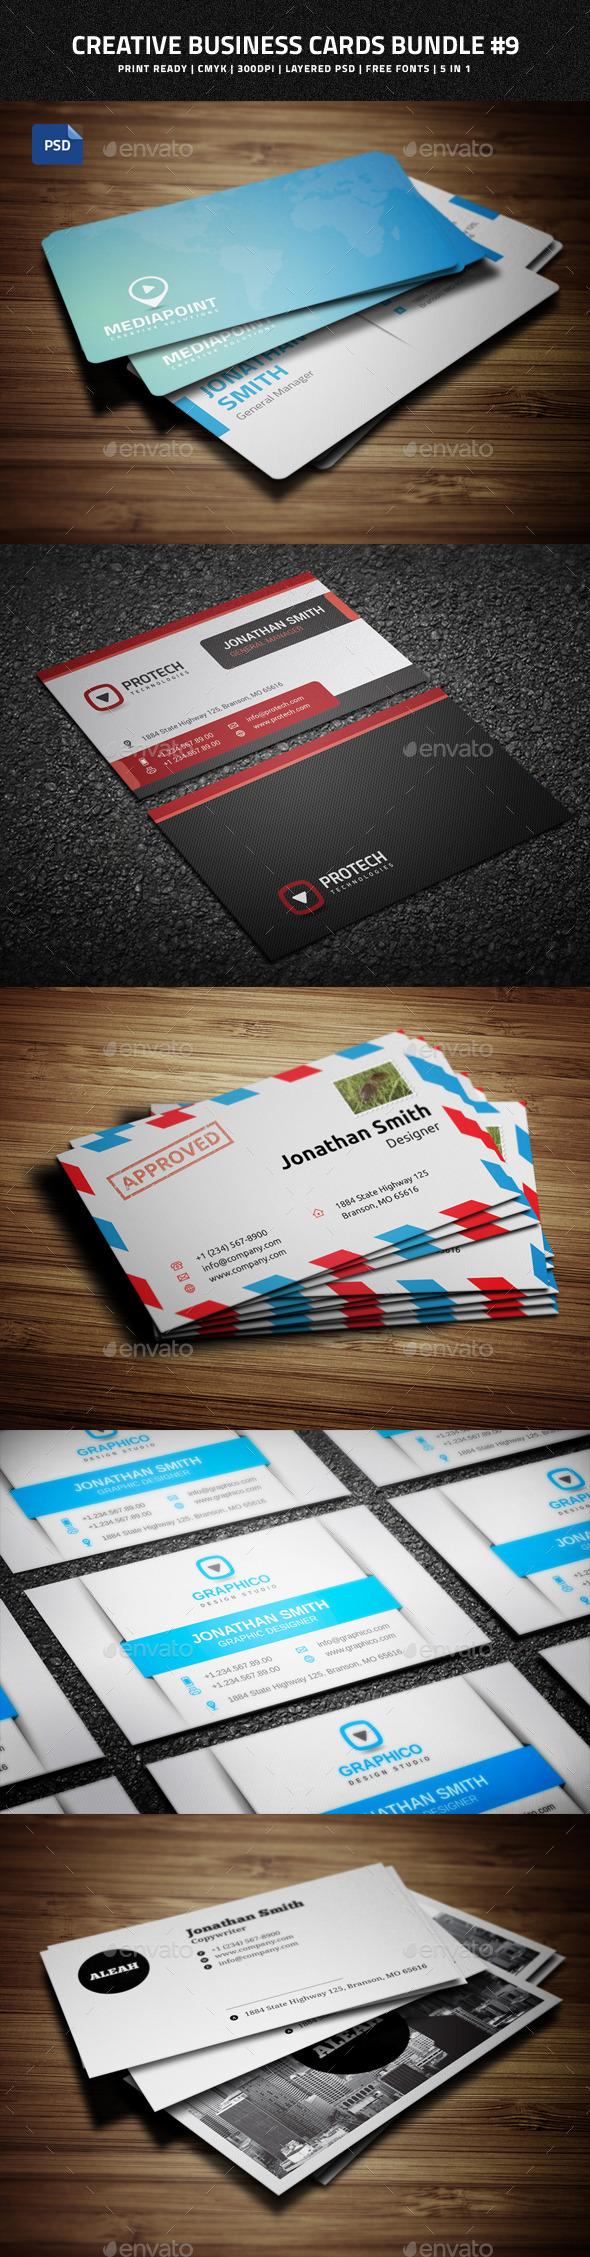 Creative Business Cards Bundle #9 - Creative Business Cards